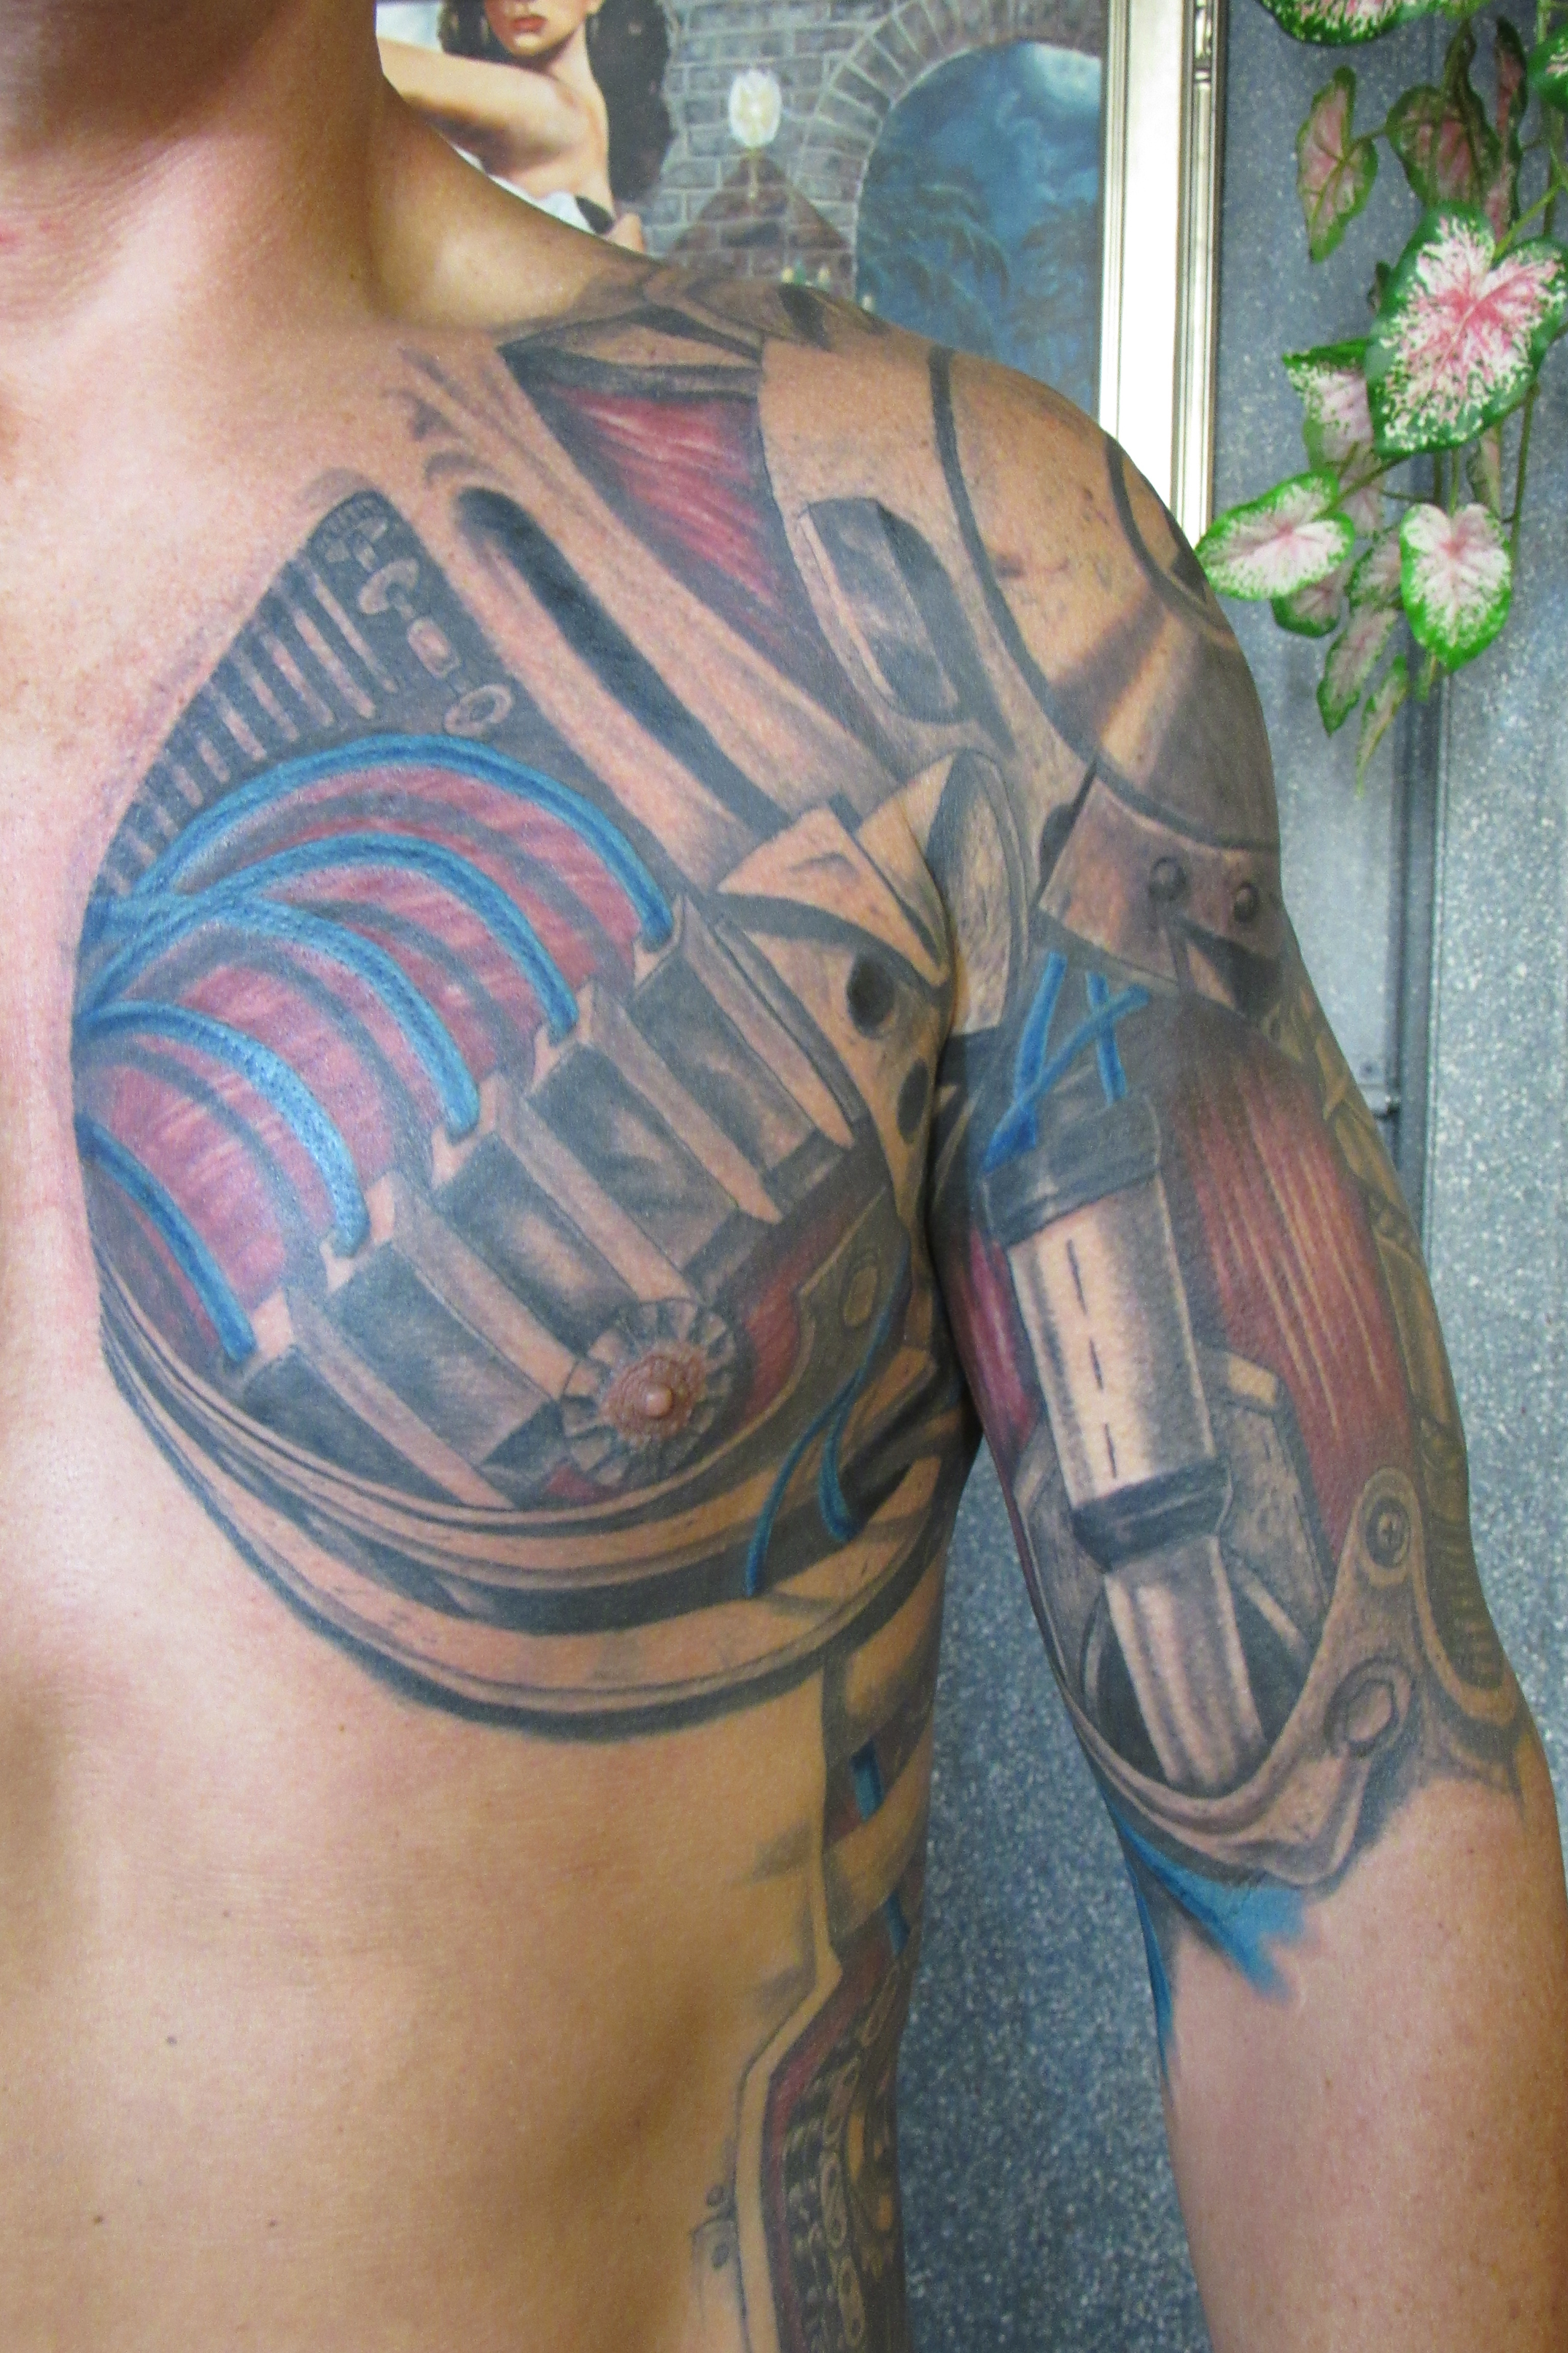 Mark Davern Tattoo | Incredible custom artwork, tattoos, portraits ...